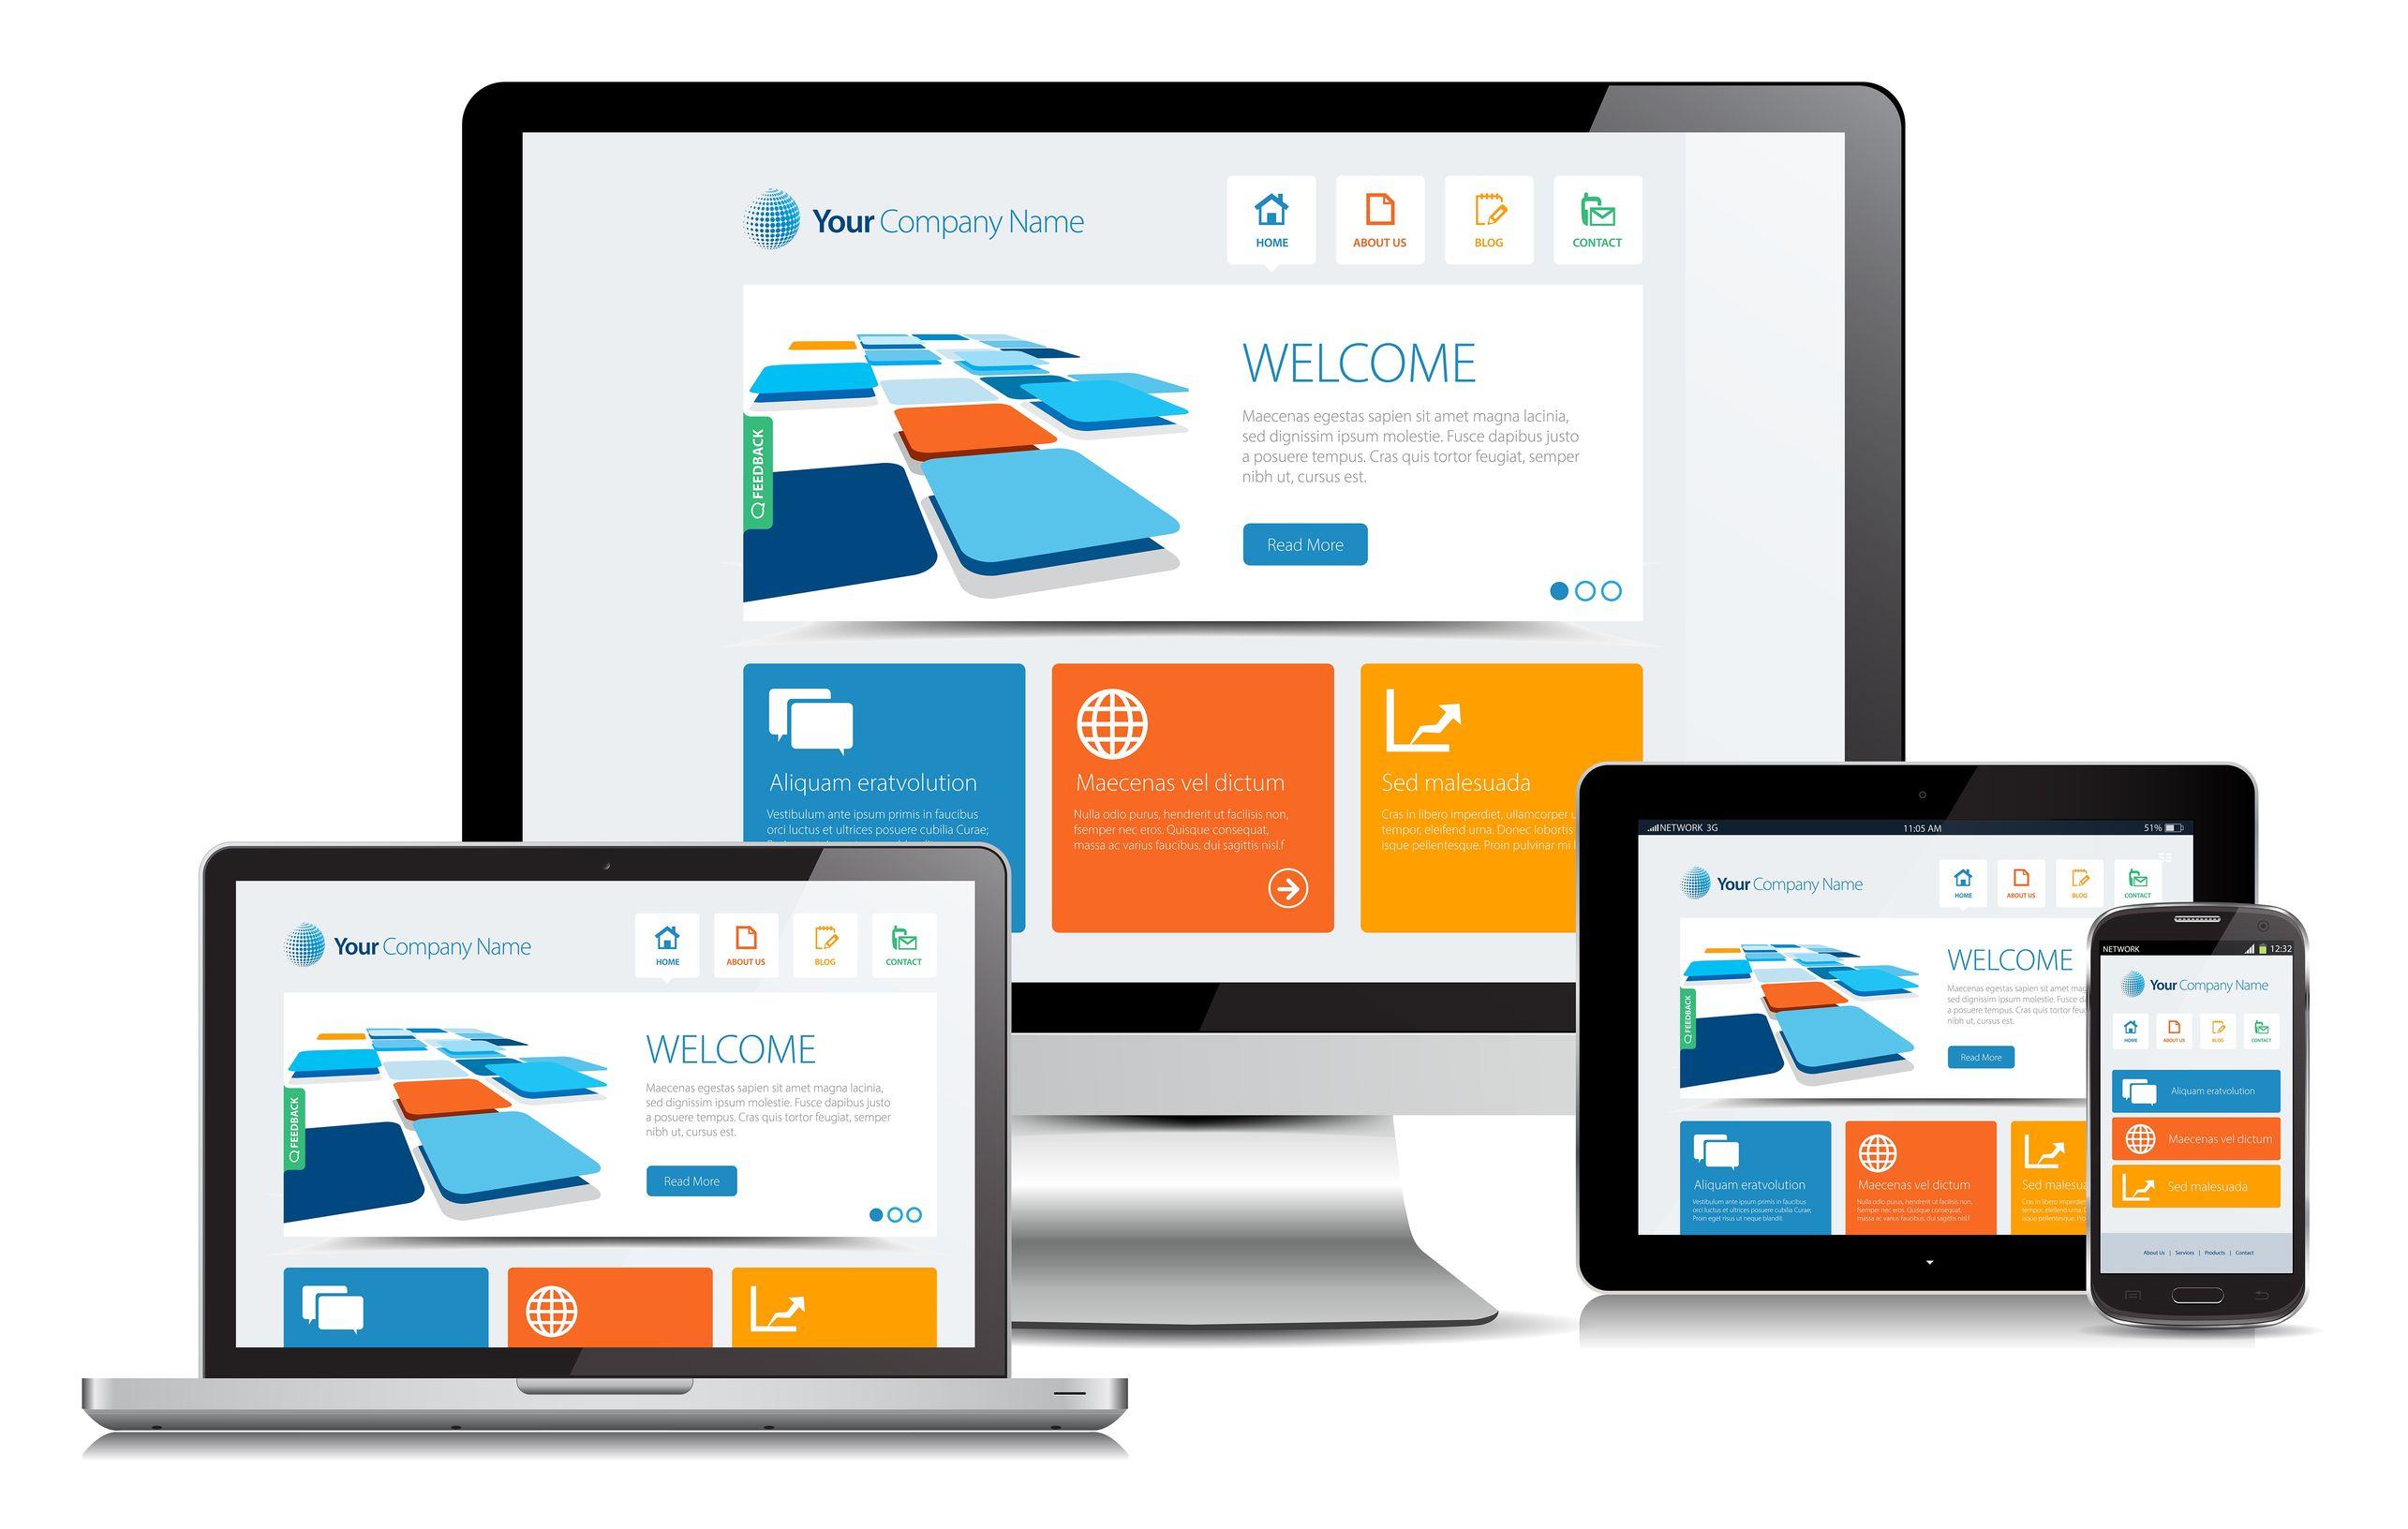 Digital Agencies and Web Designers